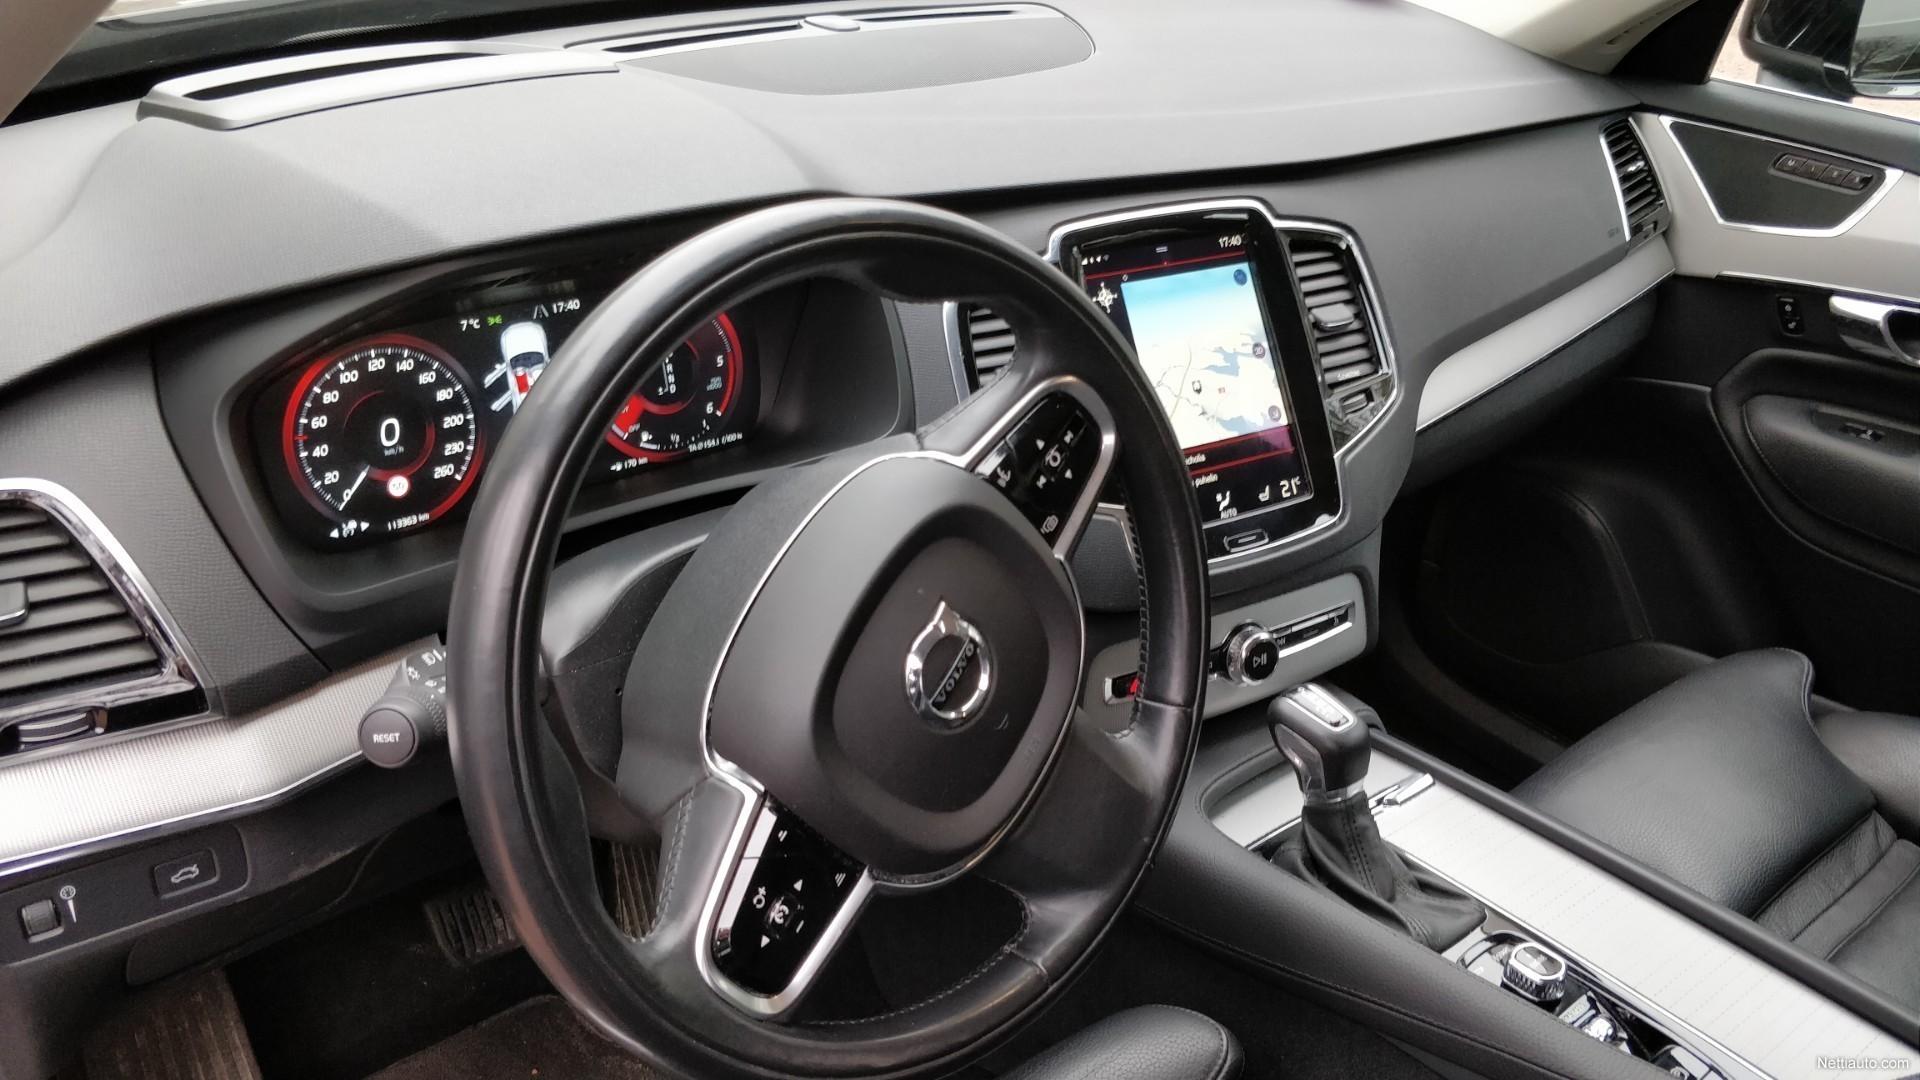 Volvo XC90 D5 AWD Inscription aut 4x4 2016 - Used vehicle